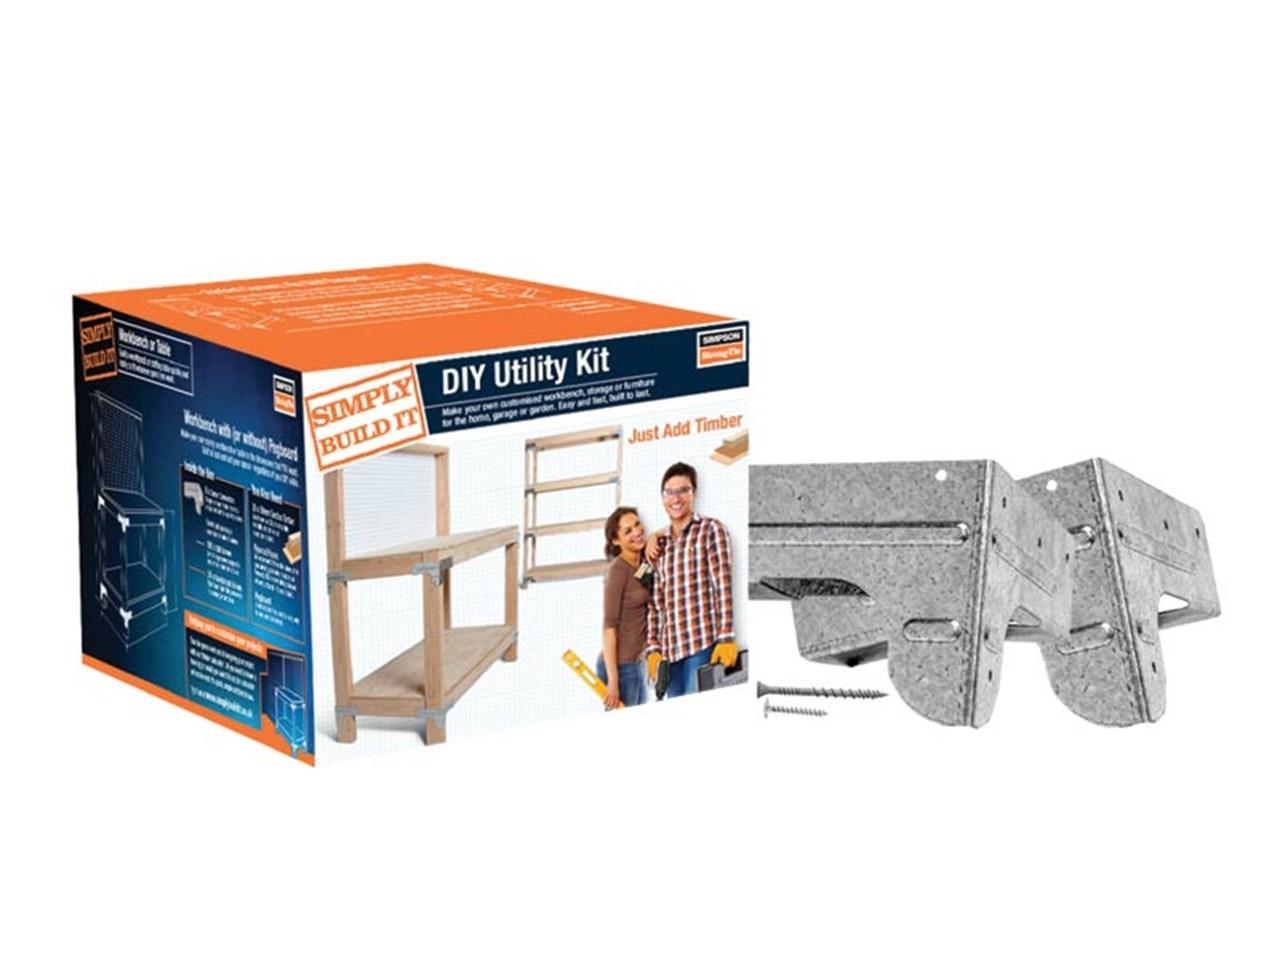 Simpson Strongtie Kwb1e Simply Build It Heavy Duty Workbench Kit